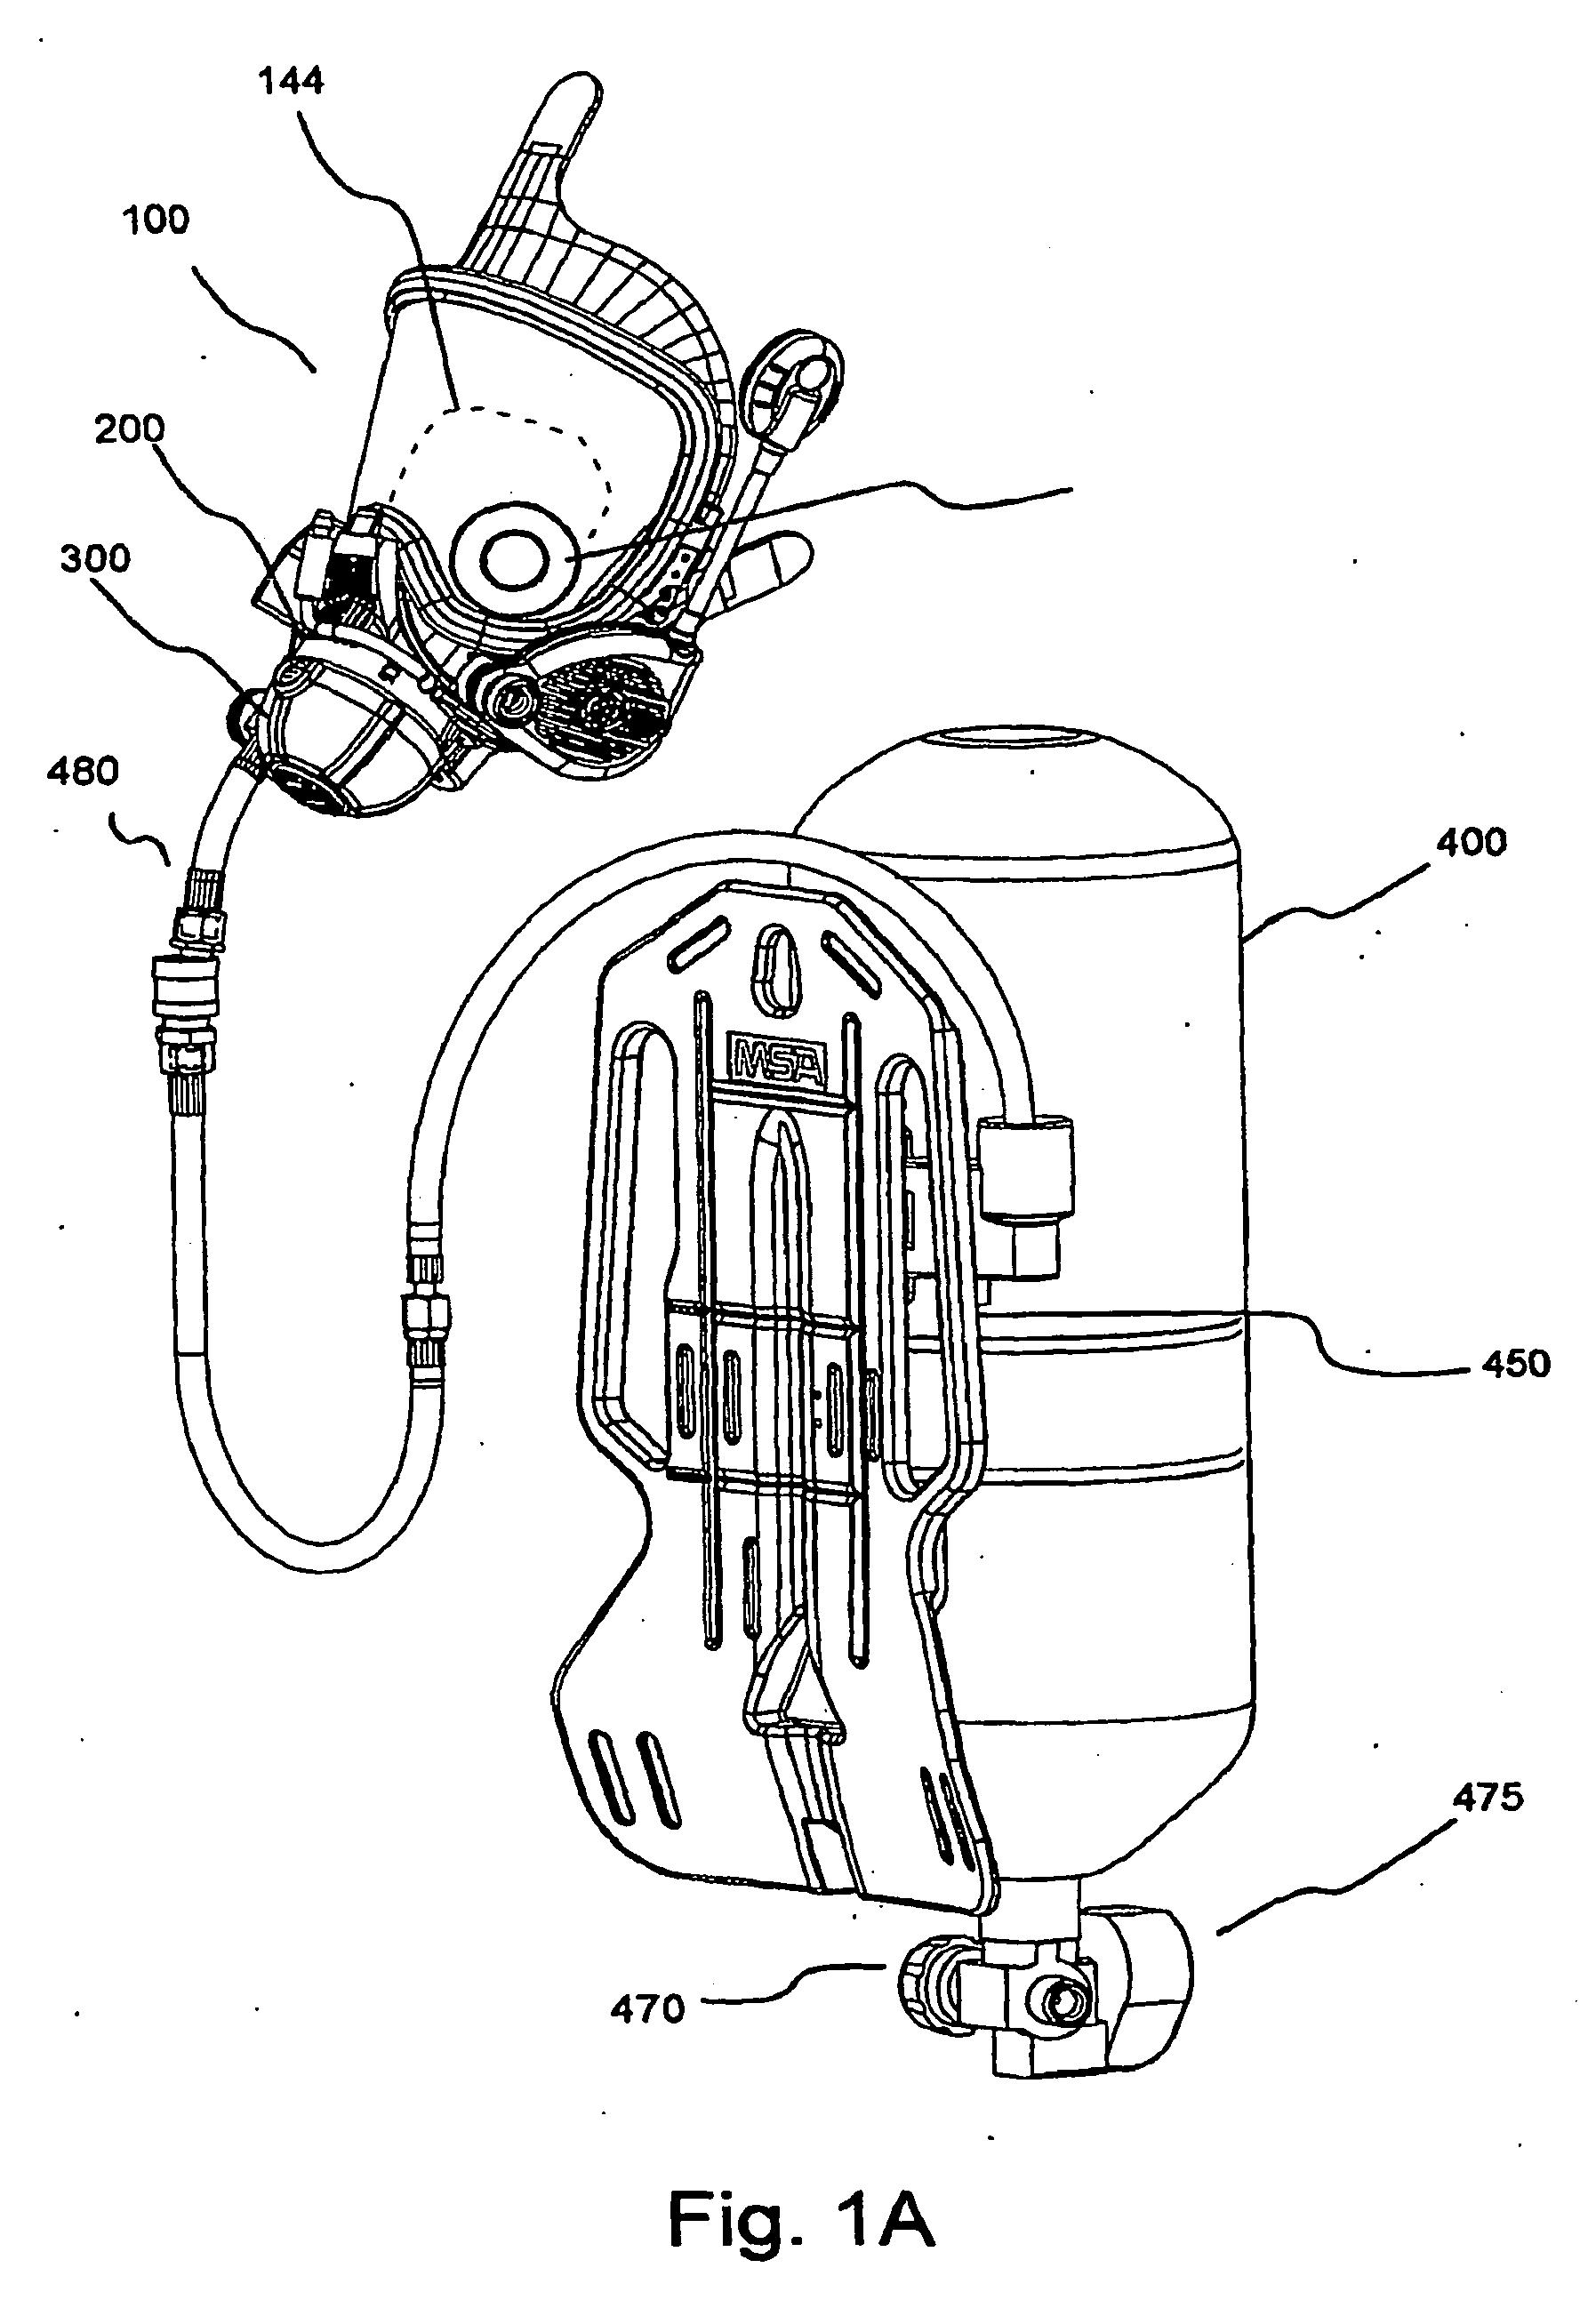 Patent Ep2010297b1